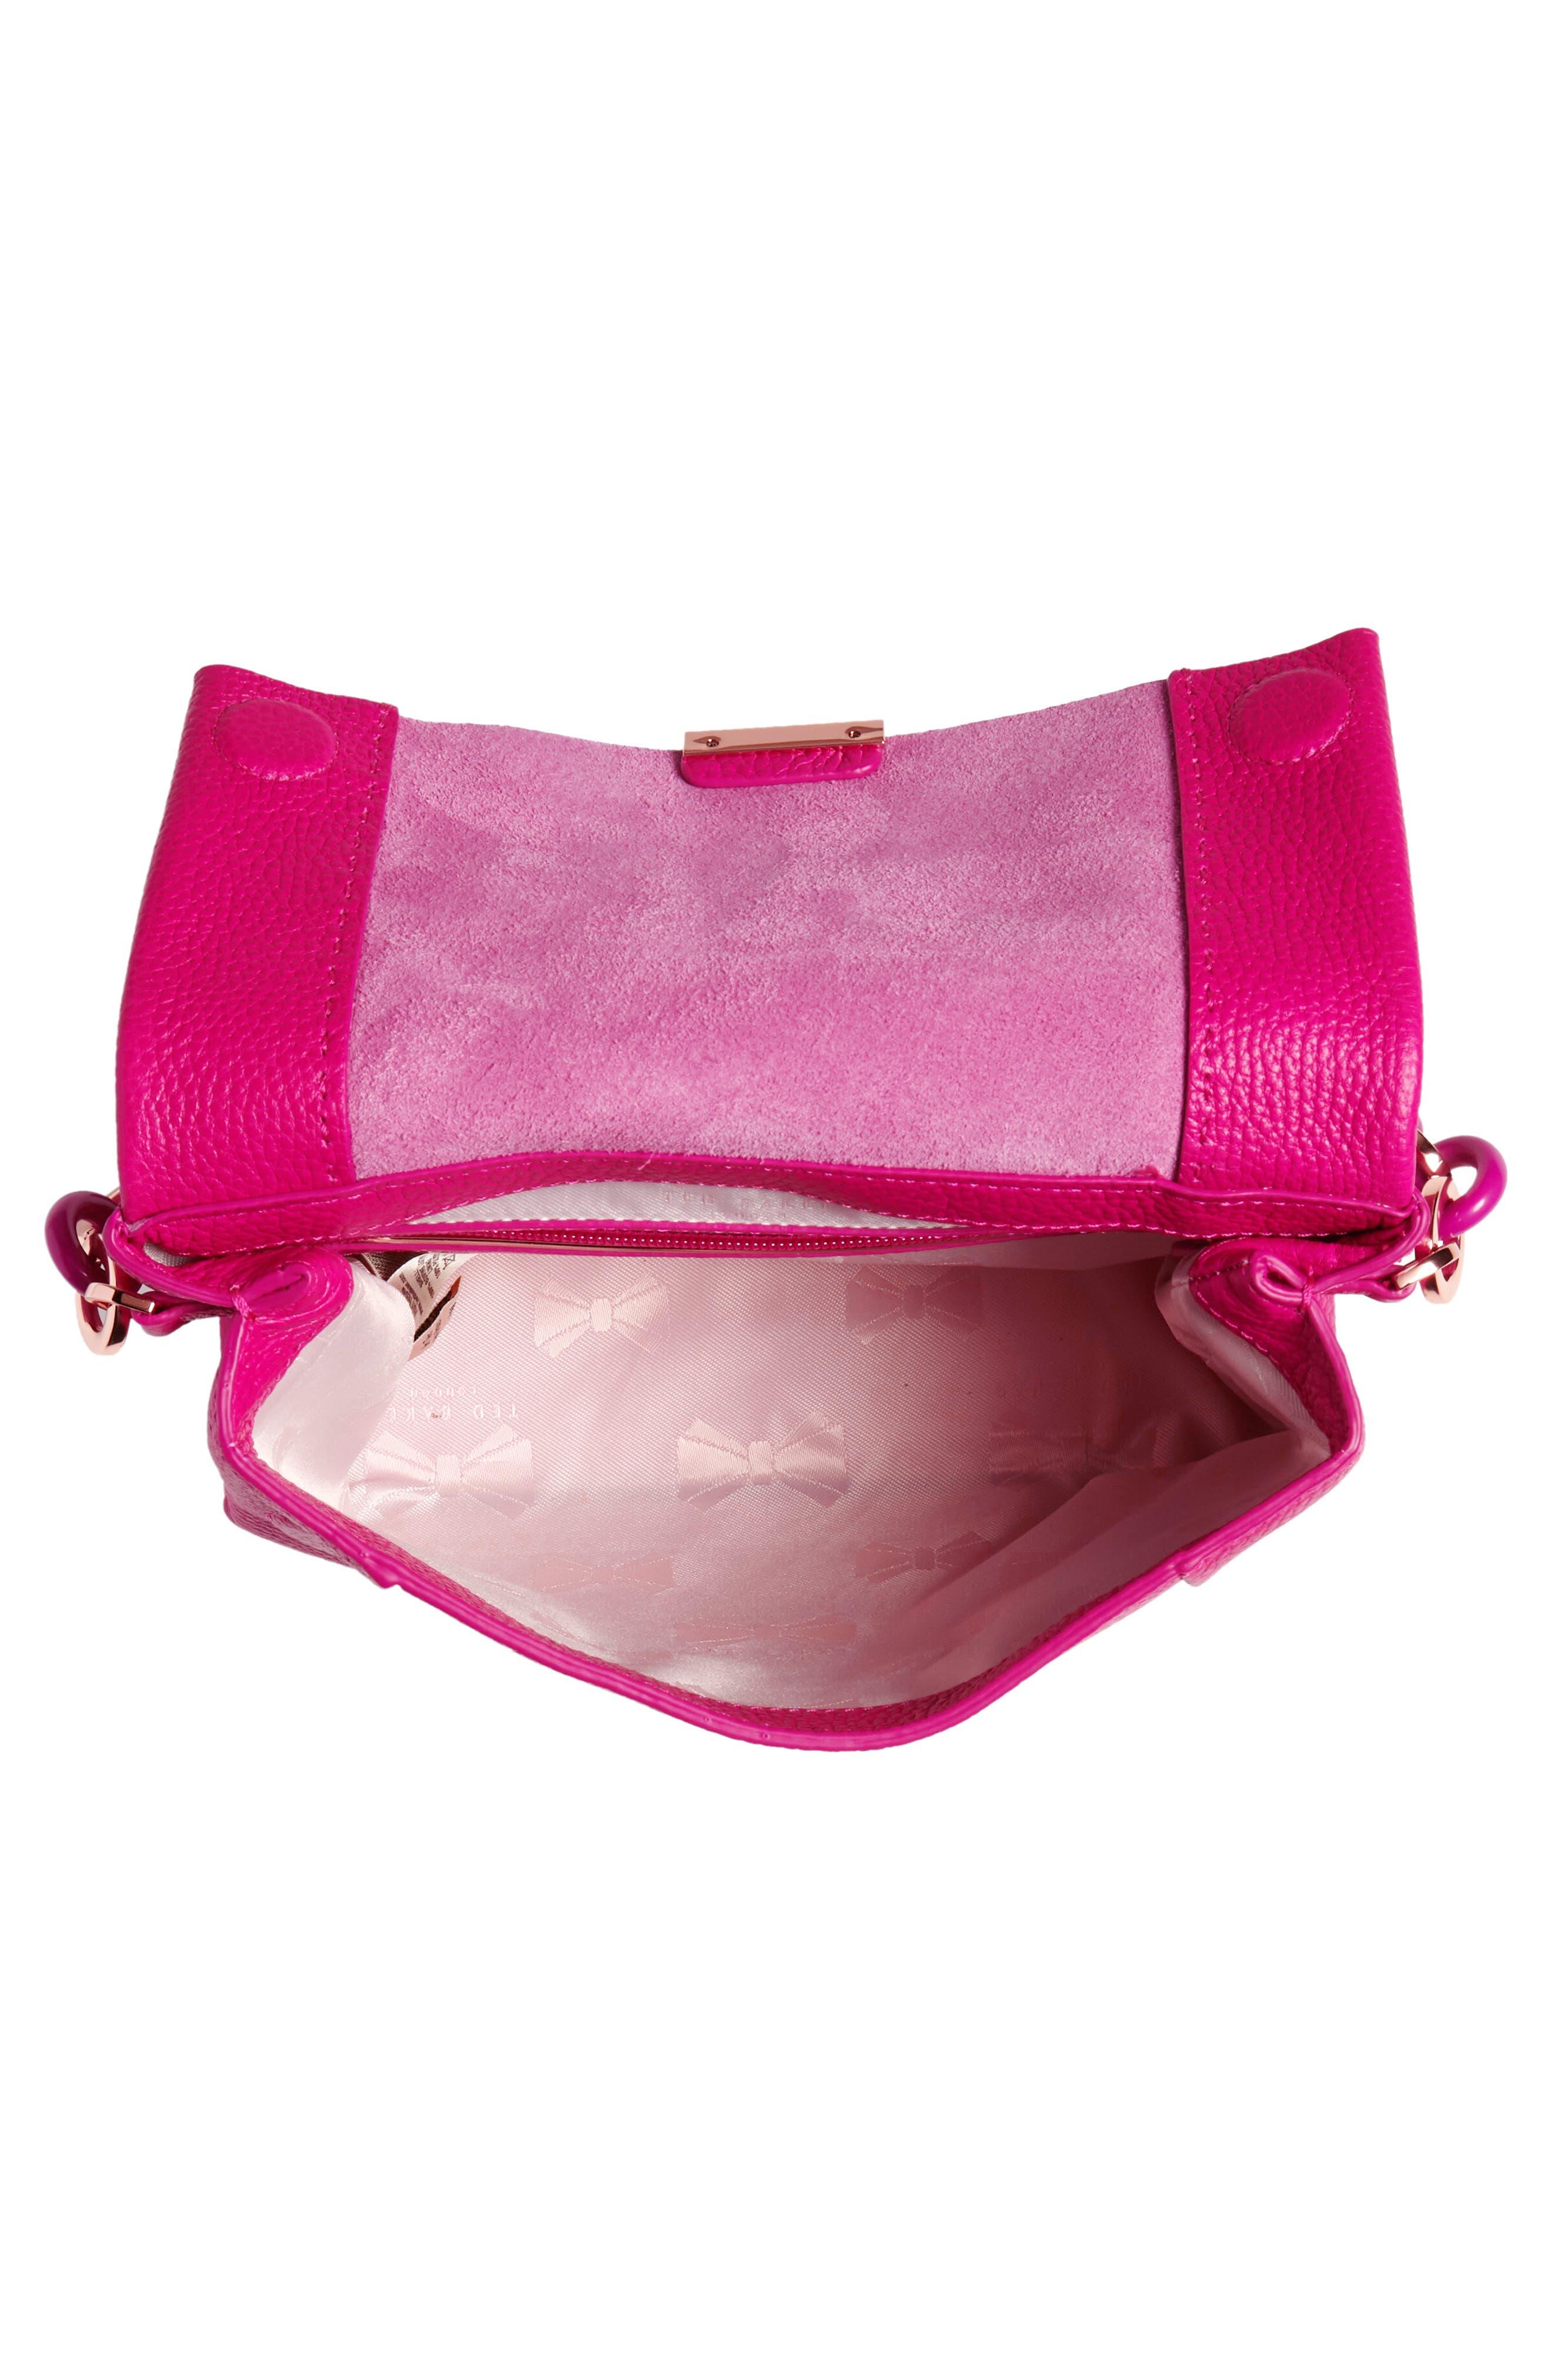 Ipomoea Leather Shoulder Bag,                             Alternate thumbnail 4, color,                             Fuchsia